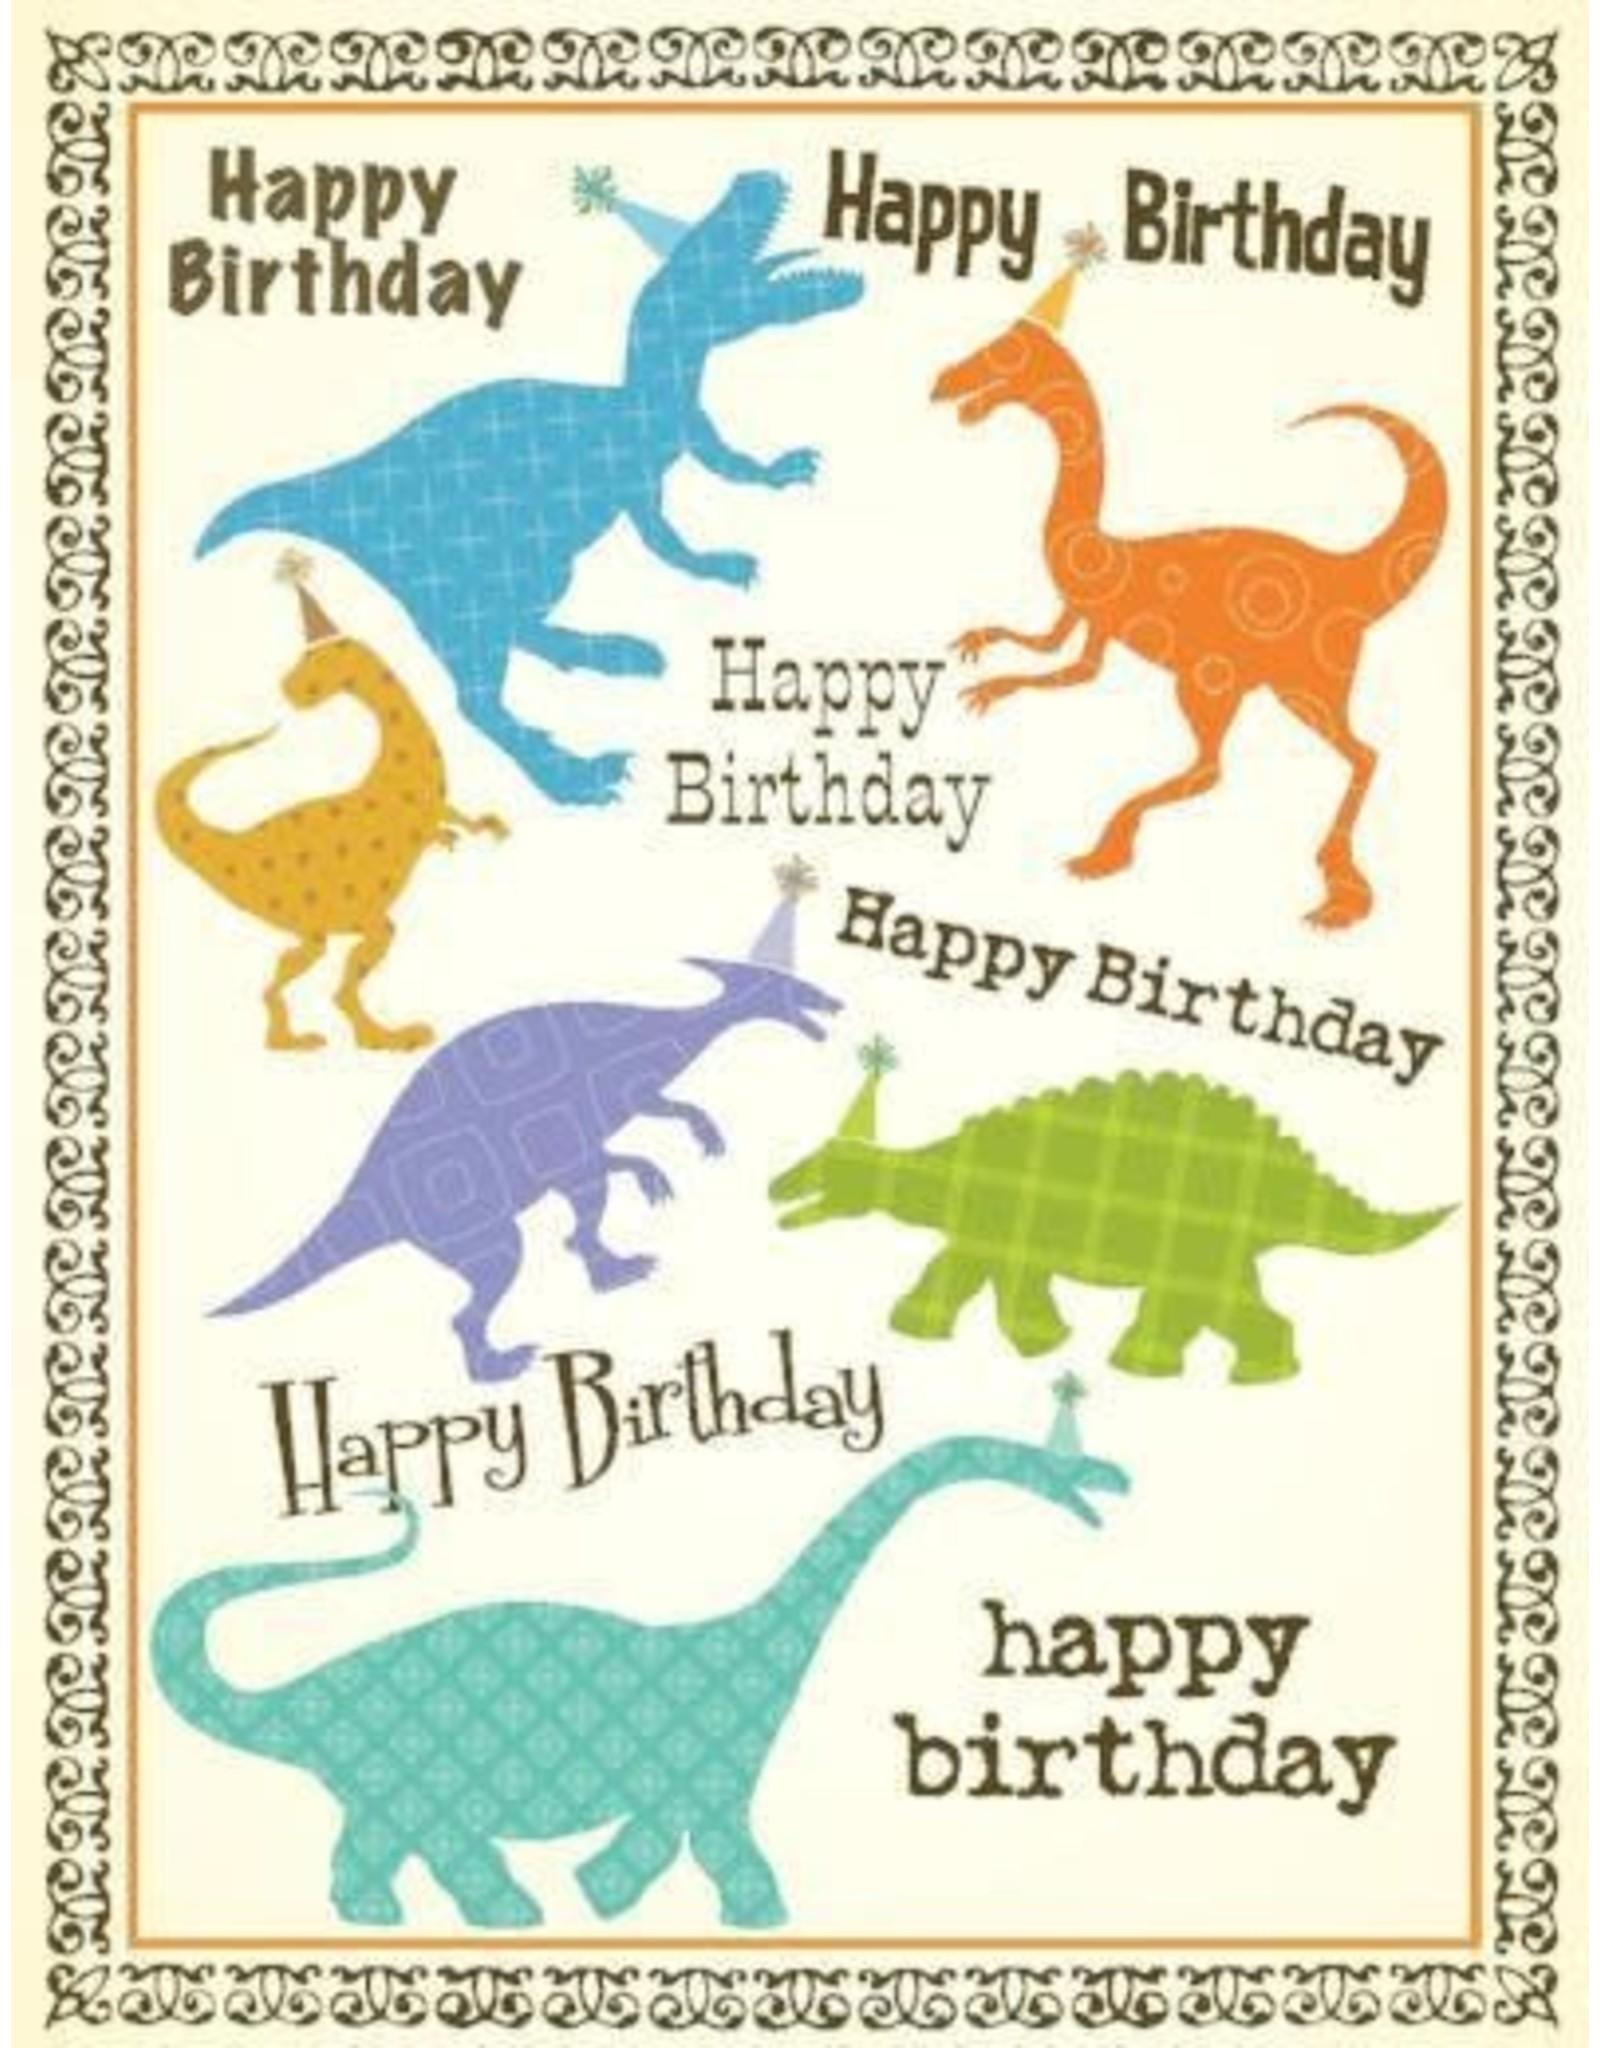 Yellow Bird Paper Greetings Dinosaur Birthday Card